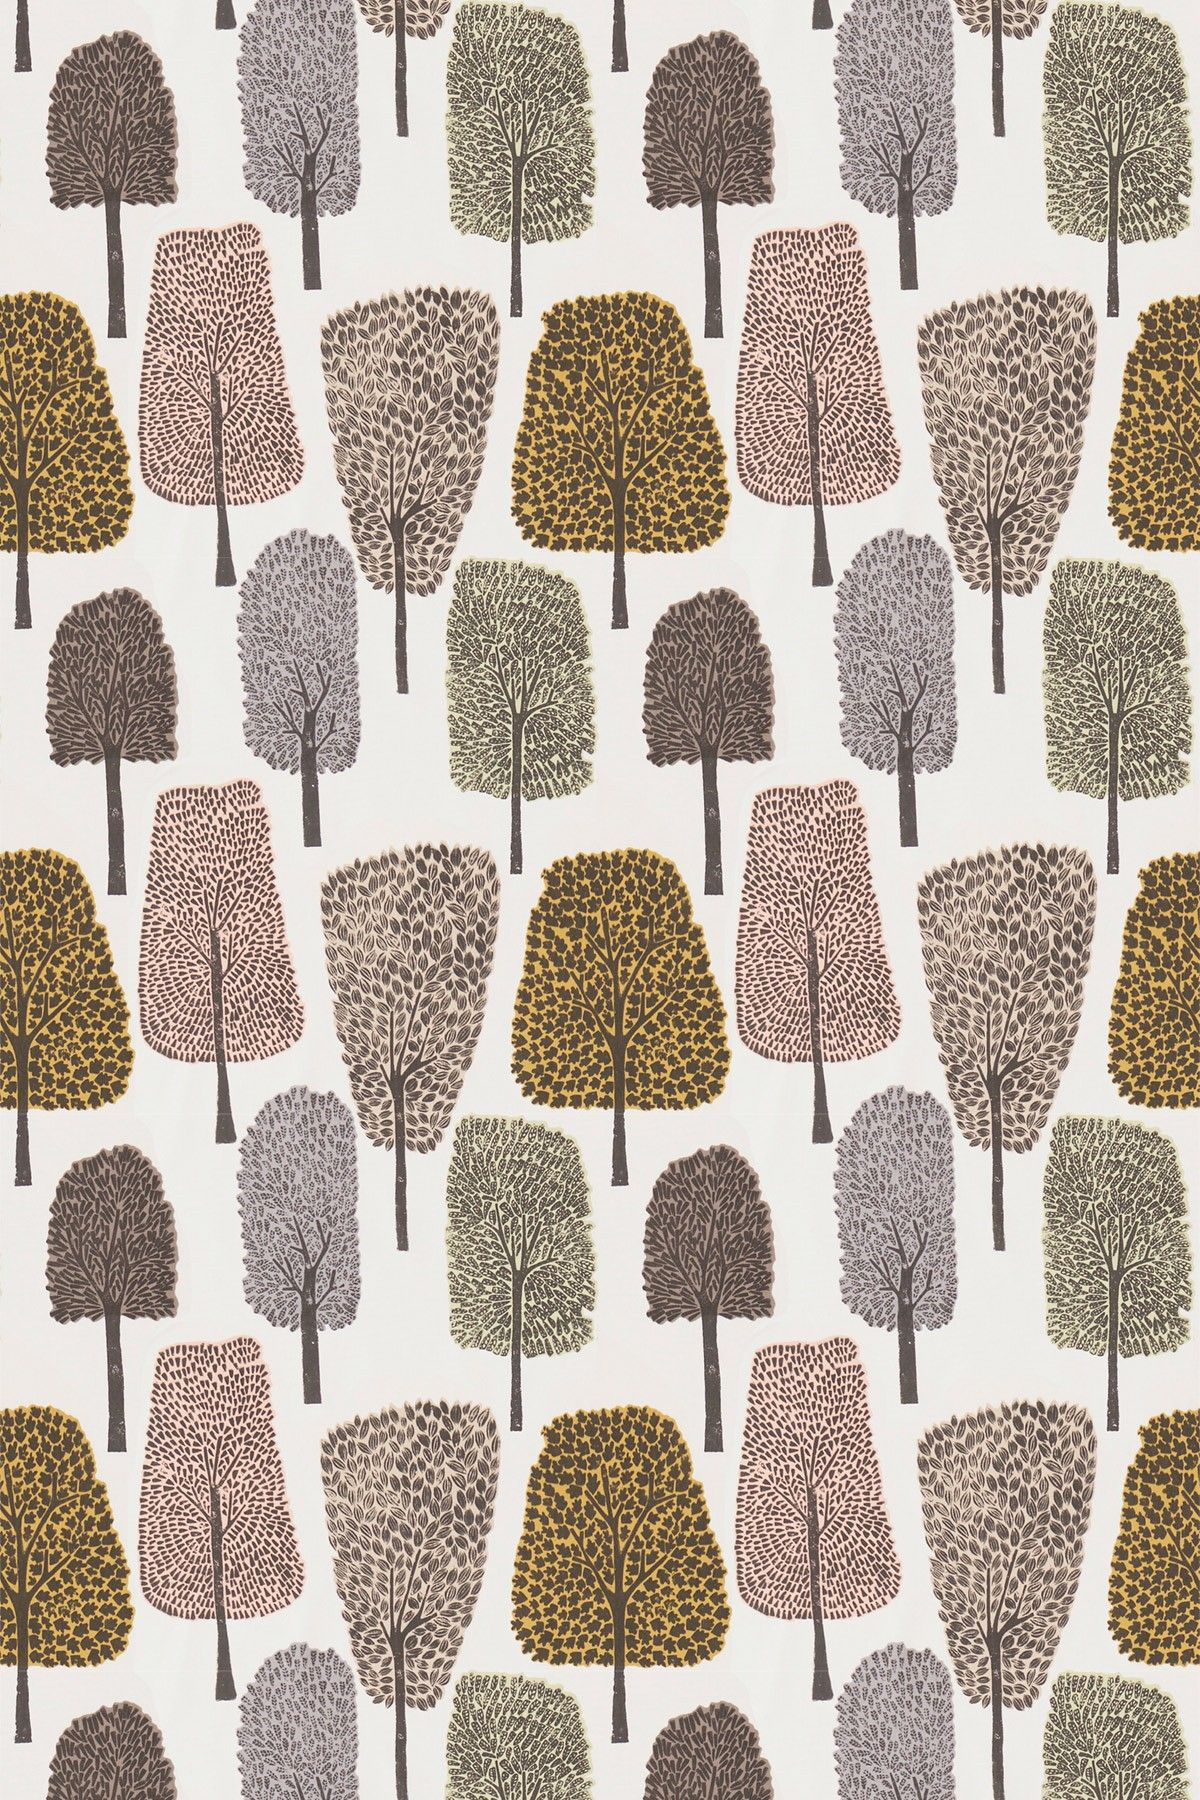 Cedar by scion blush toffee and putty fabric 120357